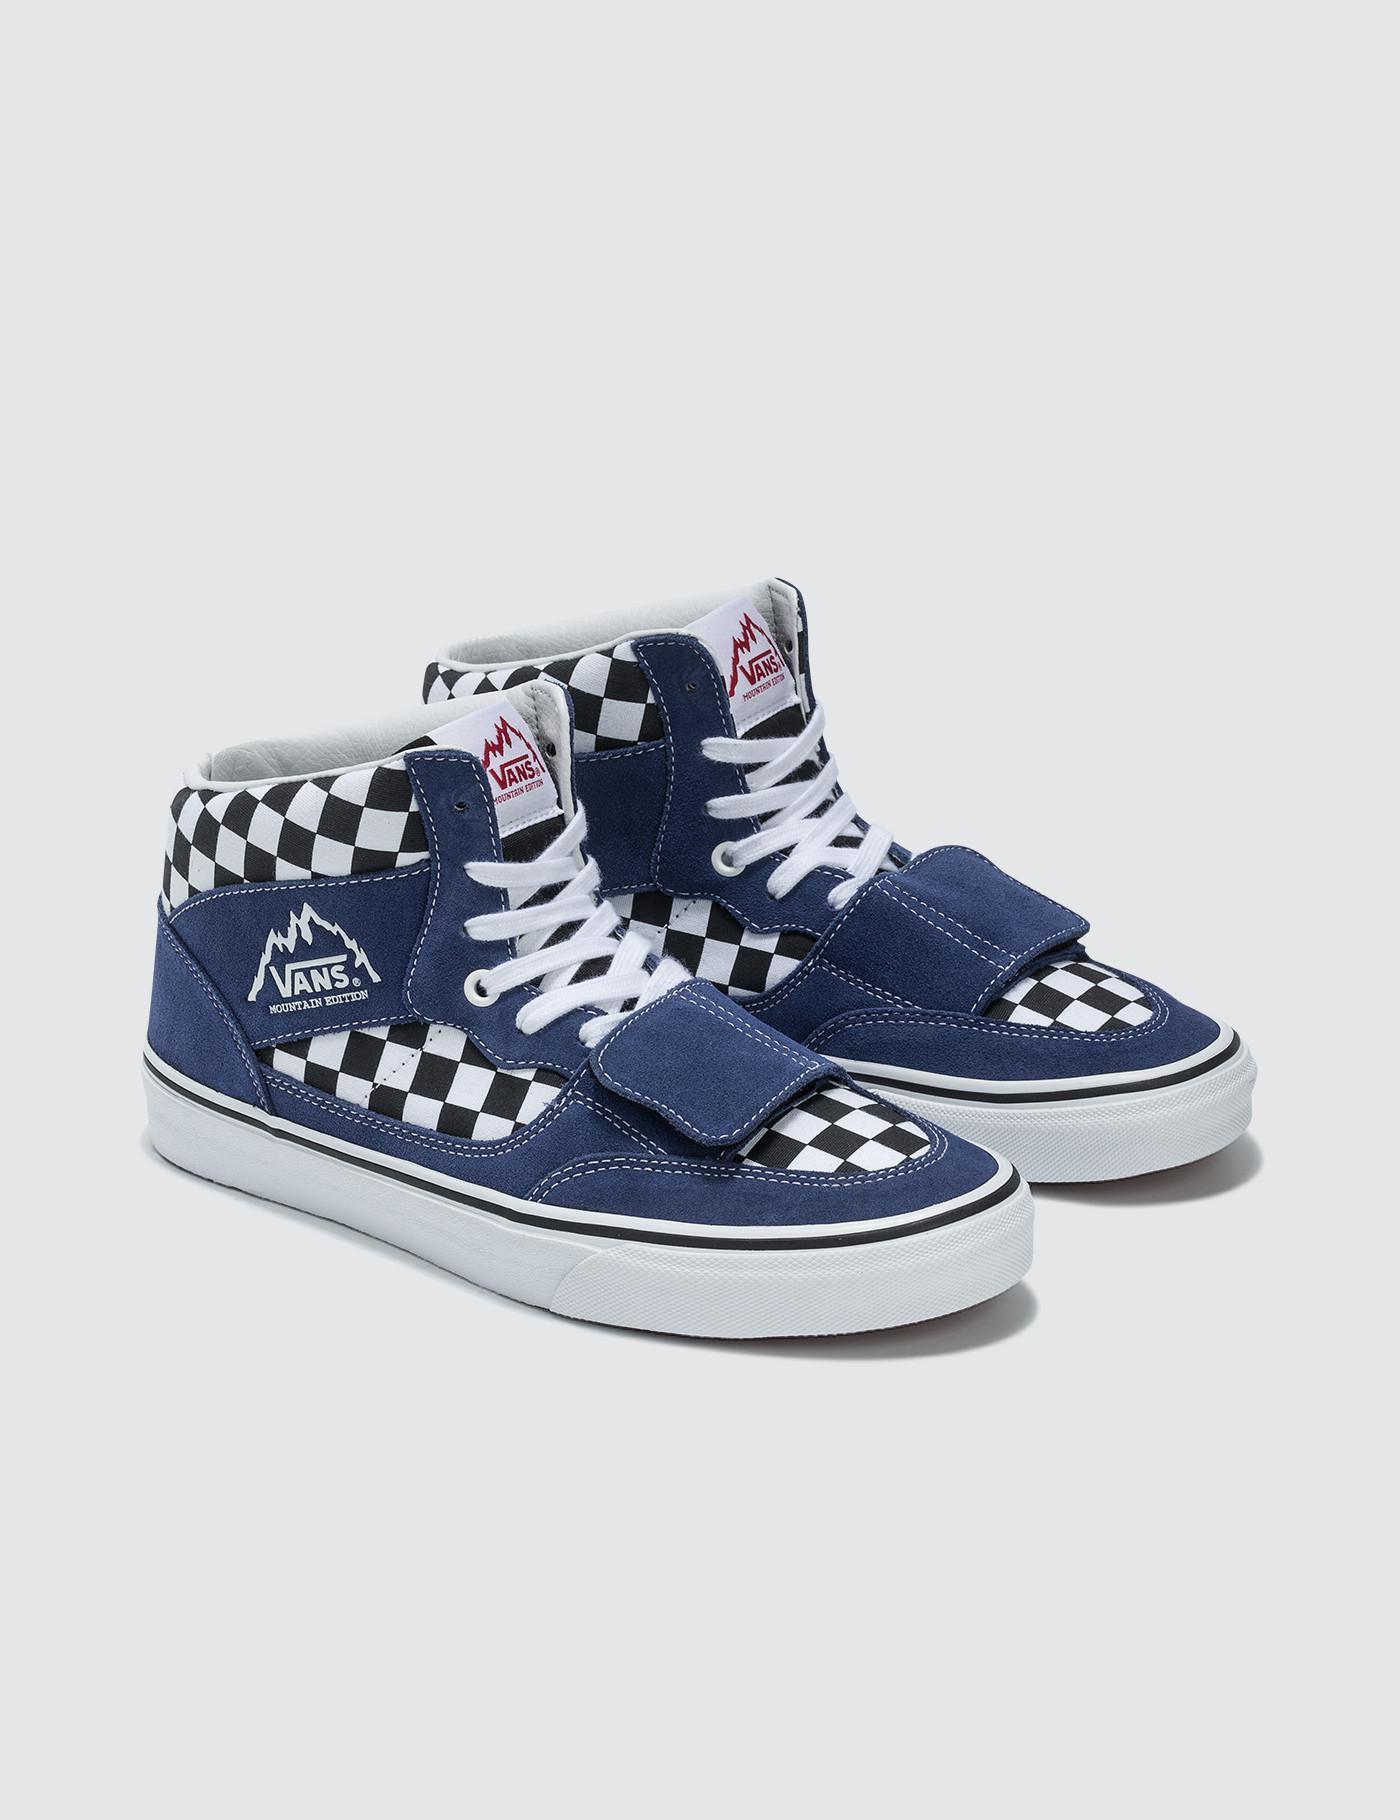 e574ea15c8 Vans Mountain Edition (checkerboard) Blue  Black in Blue for Men - Lyst